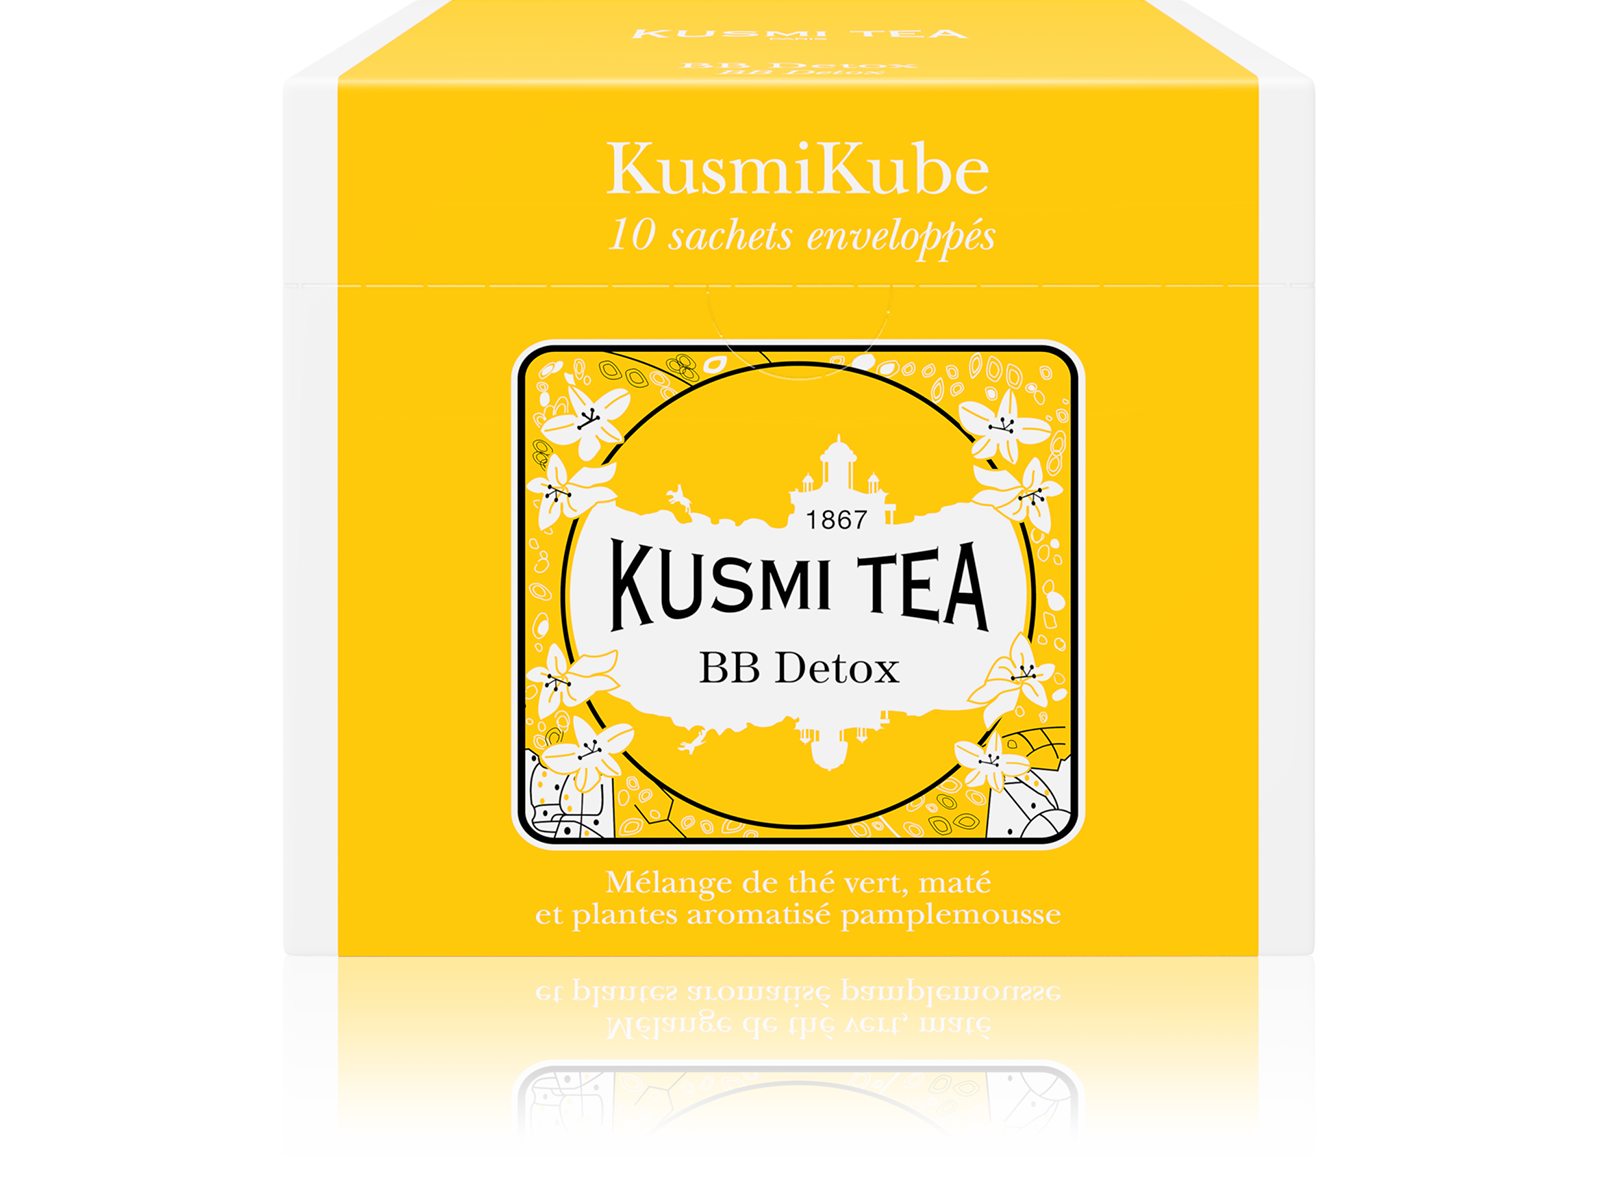 Thé vert, maté, rooibos - BB Detox - Sachets - Kusmi Tea